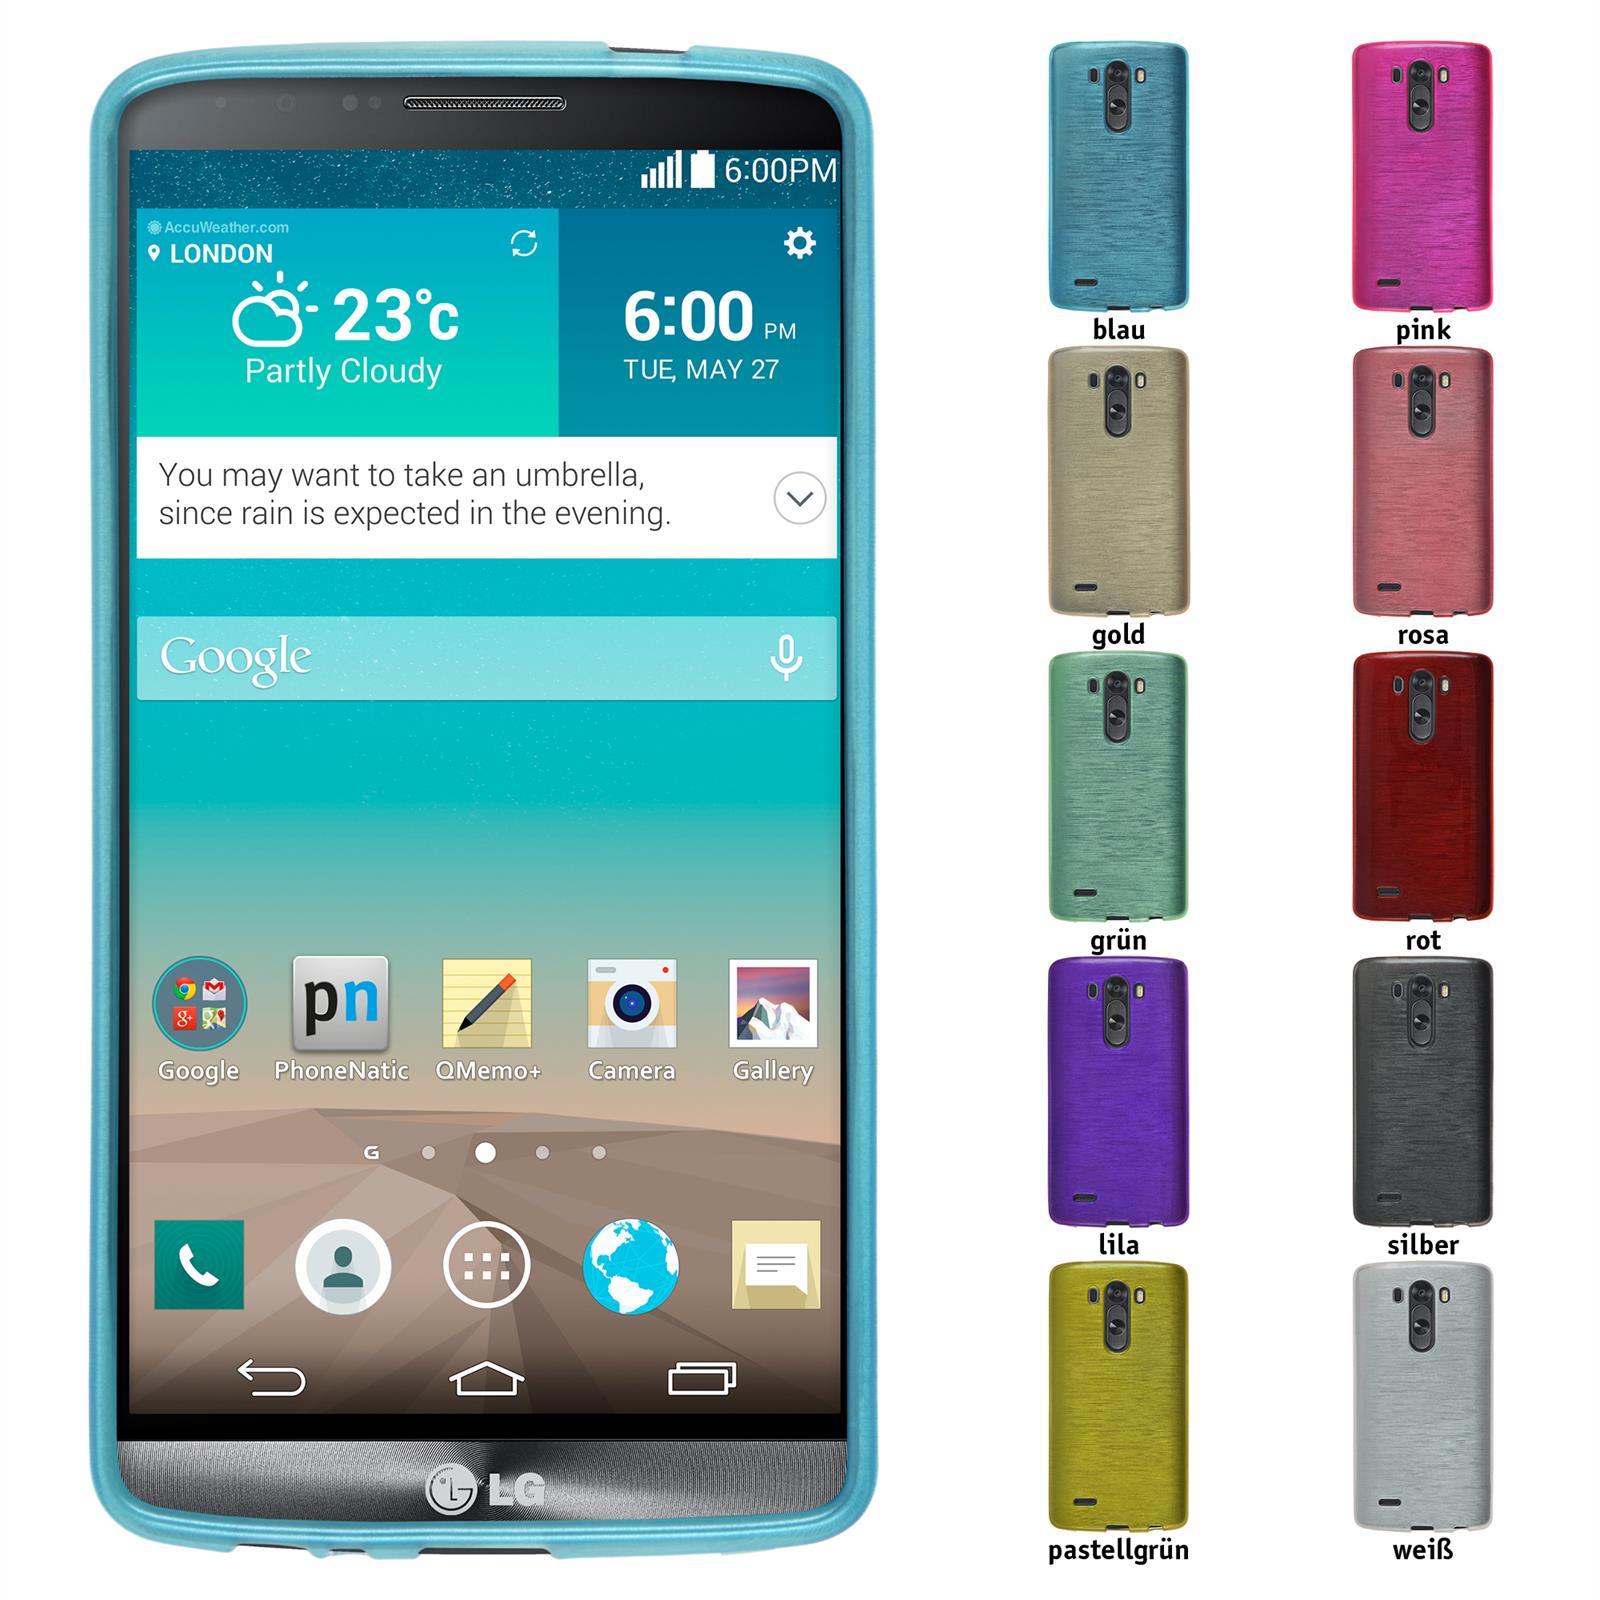 Schutzhülle für LG brushed Cover Silikonhülle Bumper Case + Schutzfolien